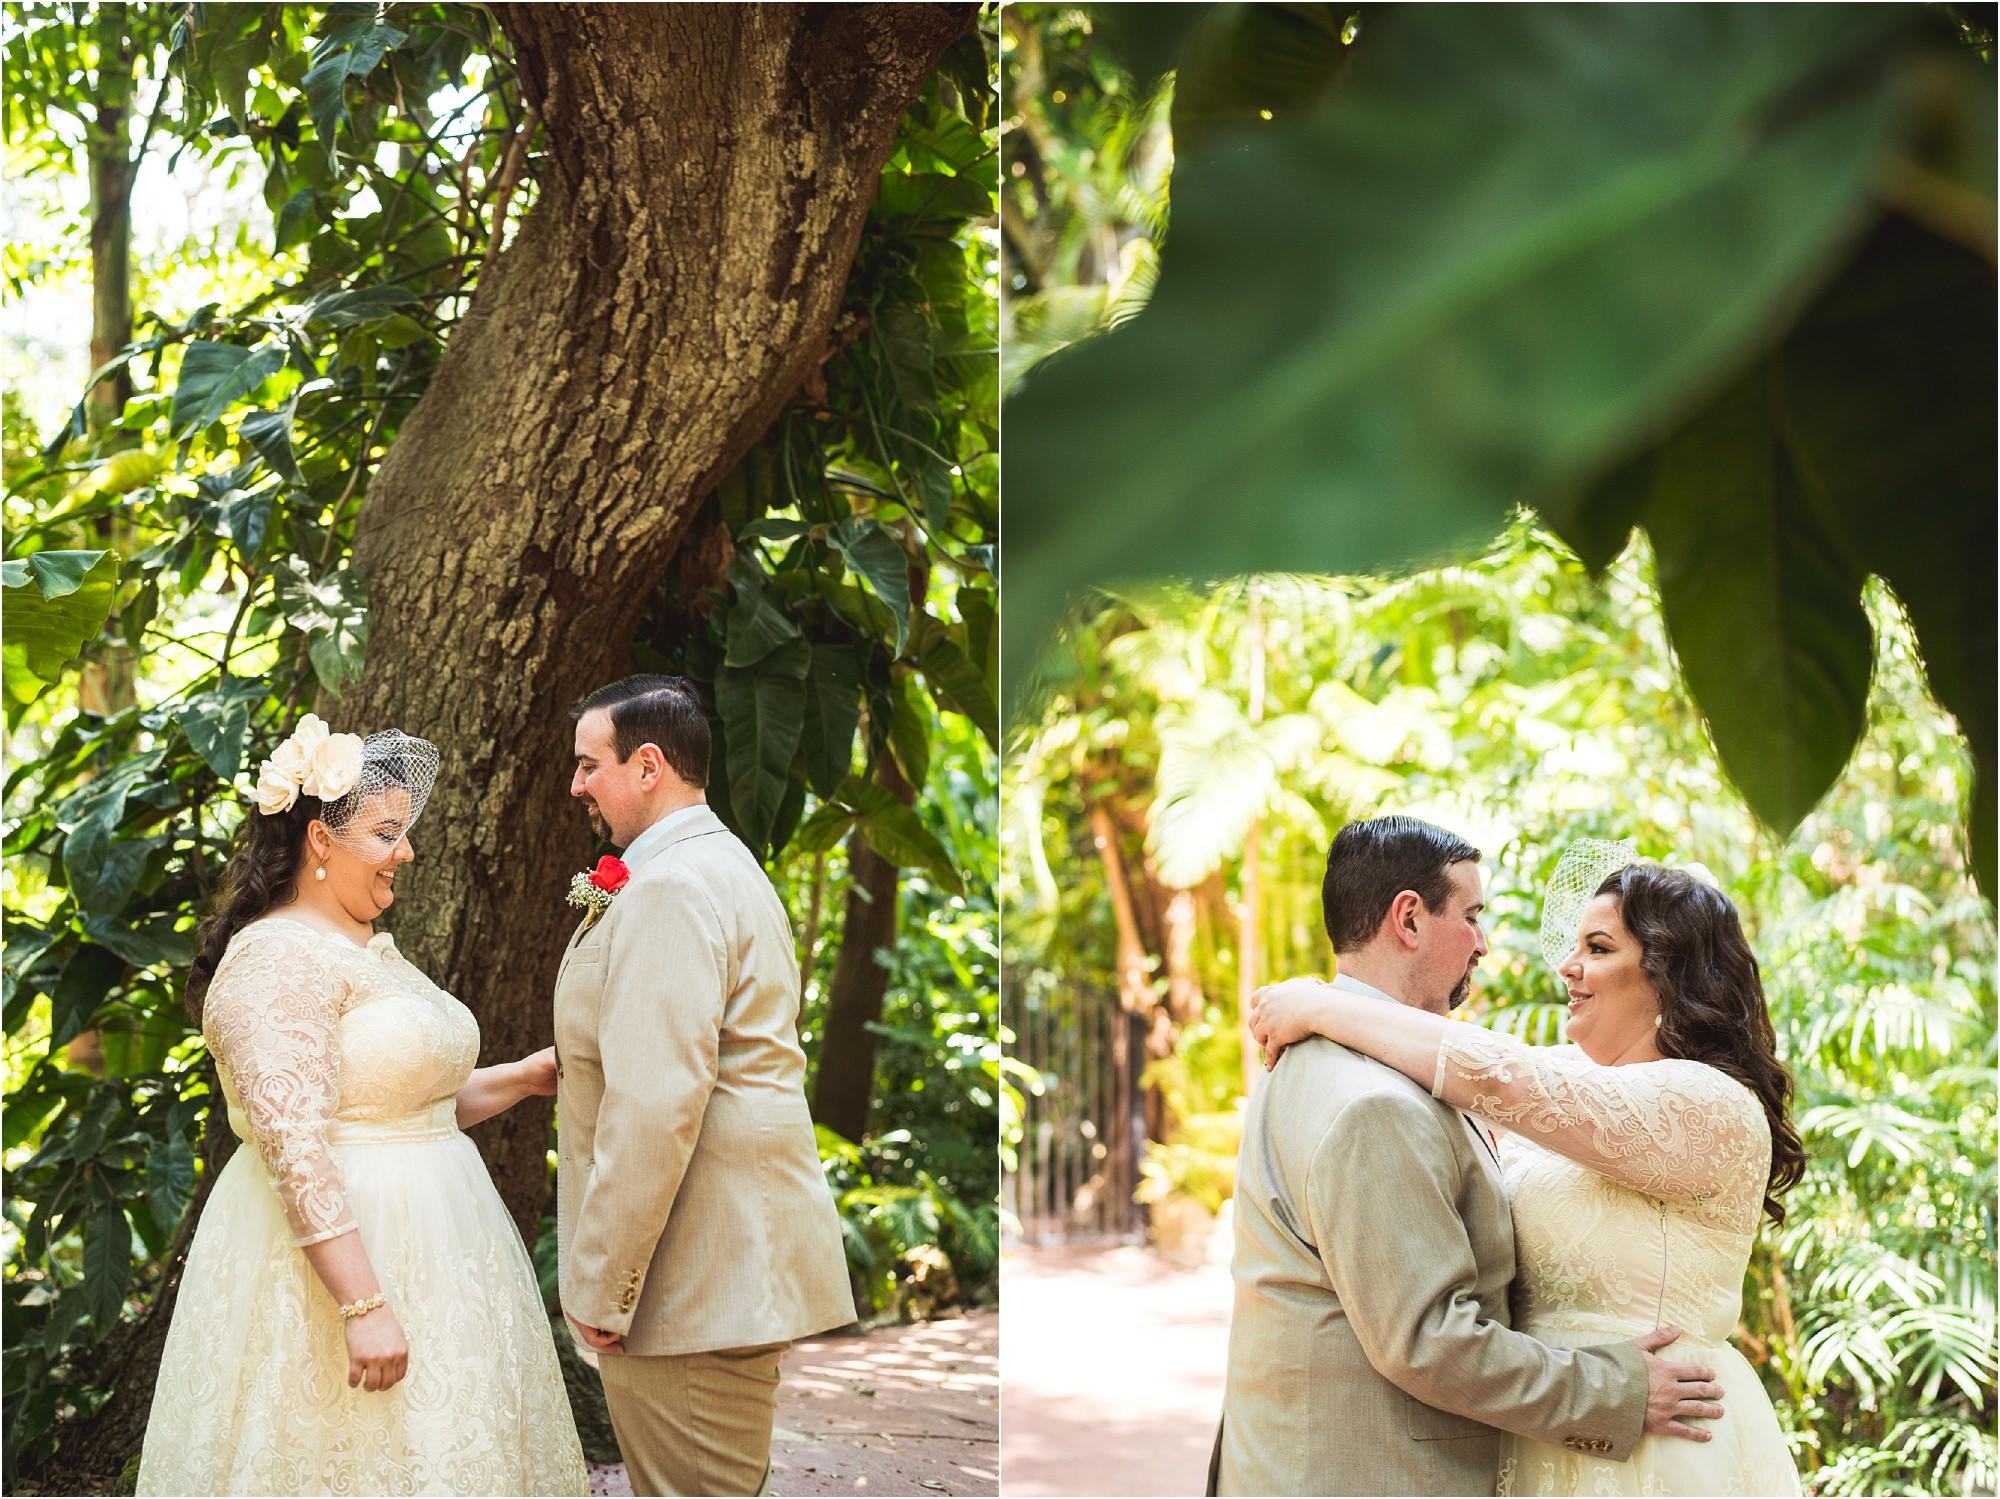 outdoor-rustic-pincrest-gardens-wedding-miami-photographer-jessenia-gonzalez_1012.jpg